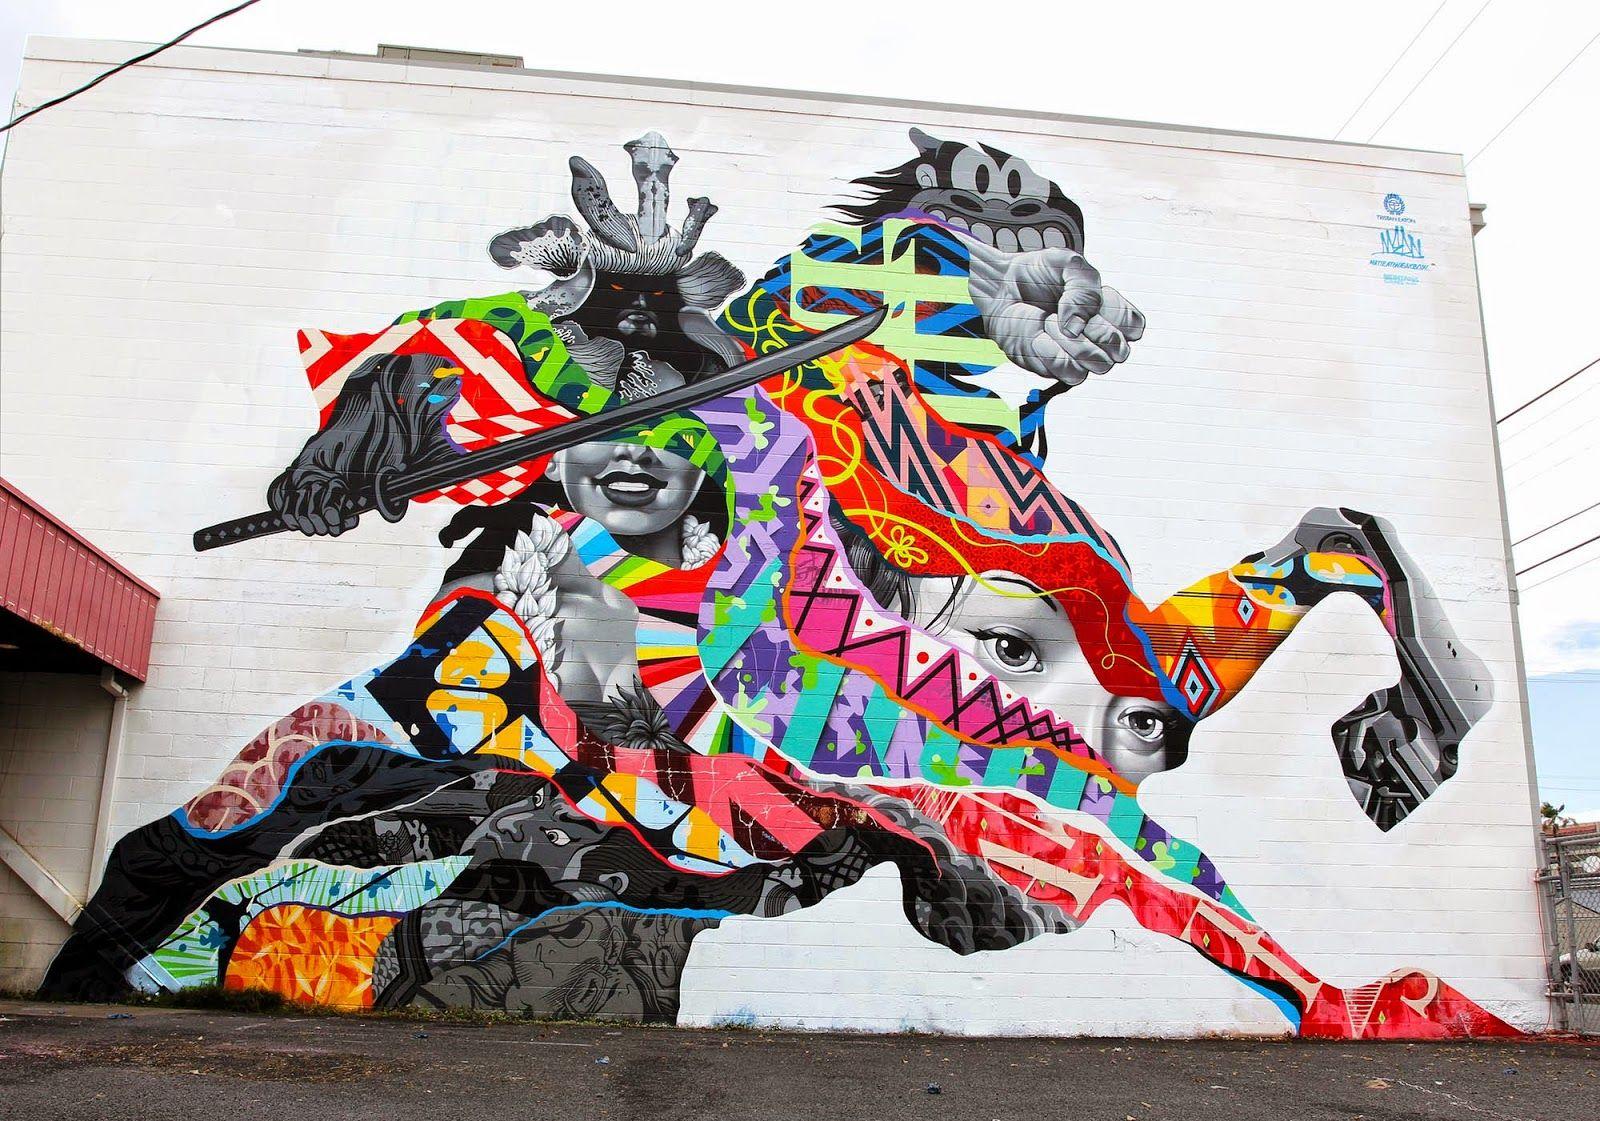 Scien pow wow hawaii 2012 pow wow hawaii pinterest pow scien pow wow hawaii 2012 pow wow hawaii pinterest pow wow hawaii and graffiti artwork amipublicfo Image collections